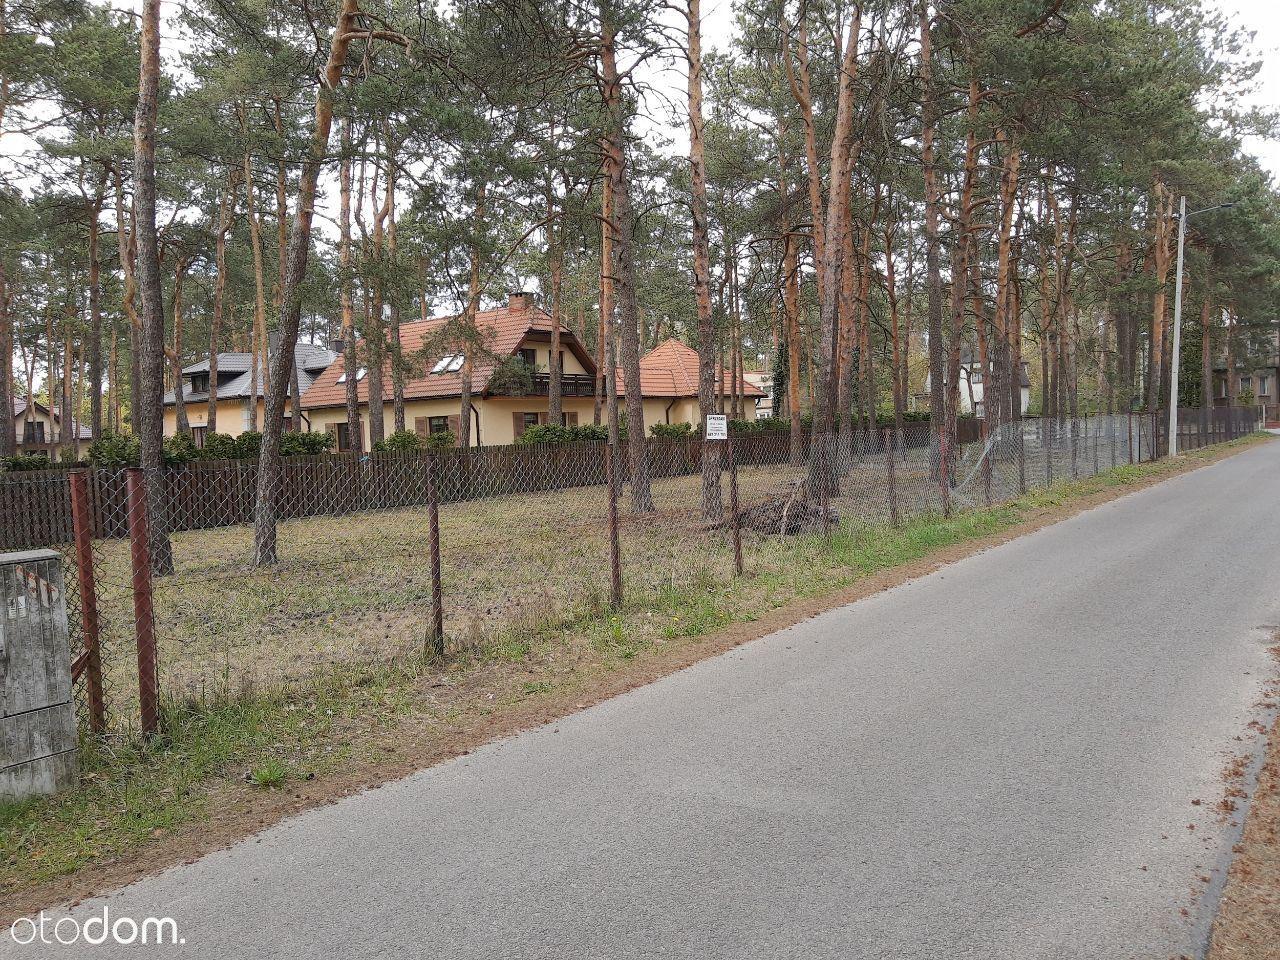 Żarki Letnisko działka leśna budowlana nad basenem